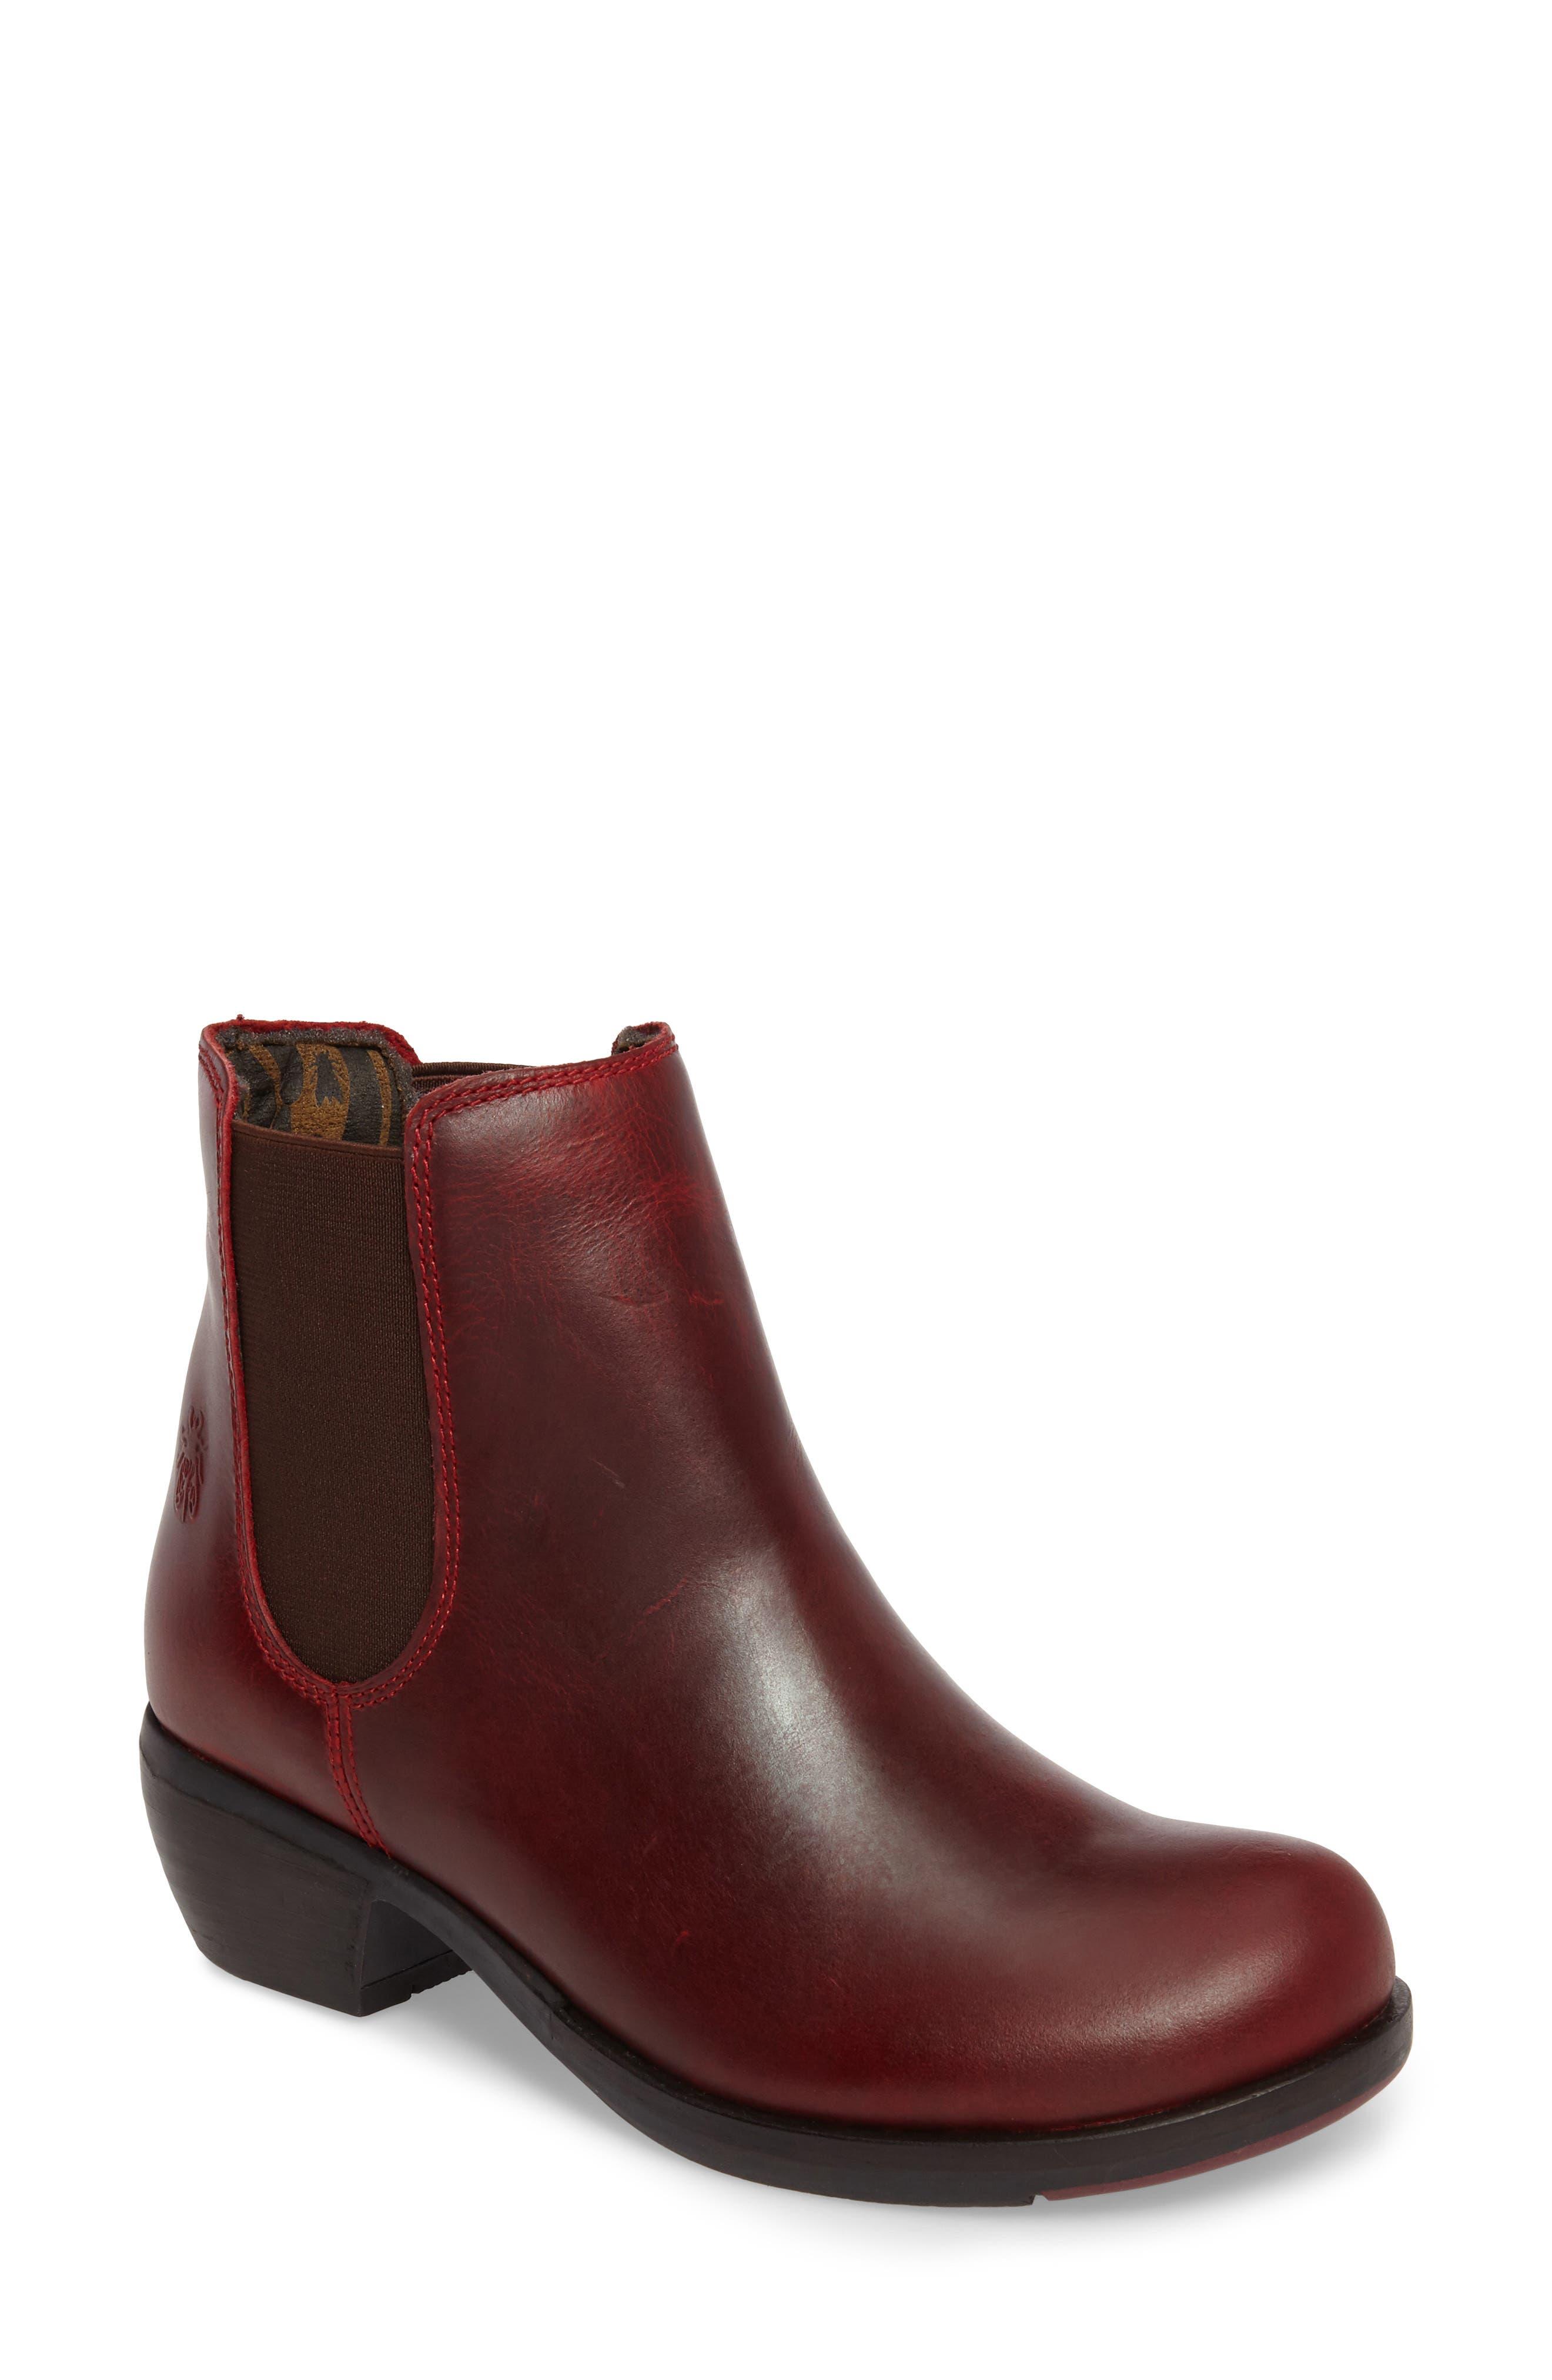 Main Image - Fly London 'Make' Chelsea Boot (Women)